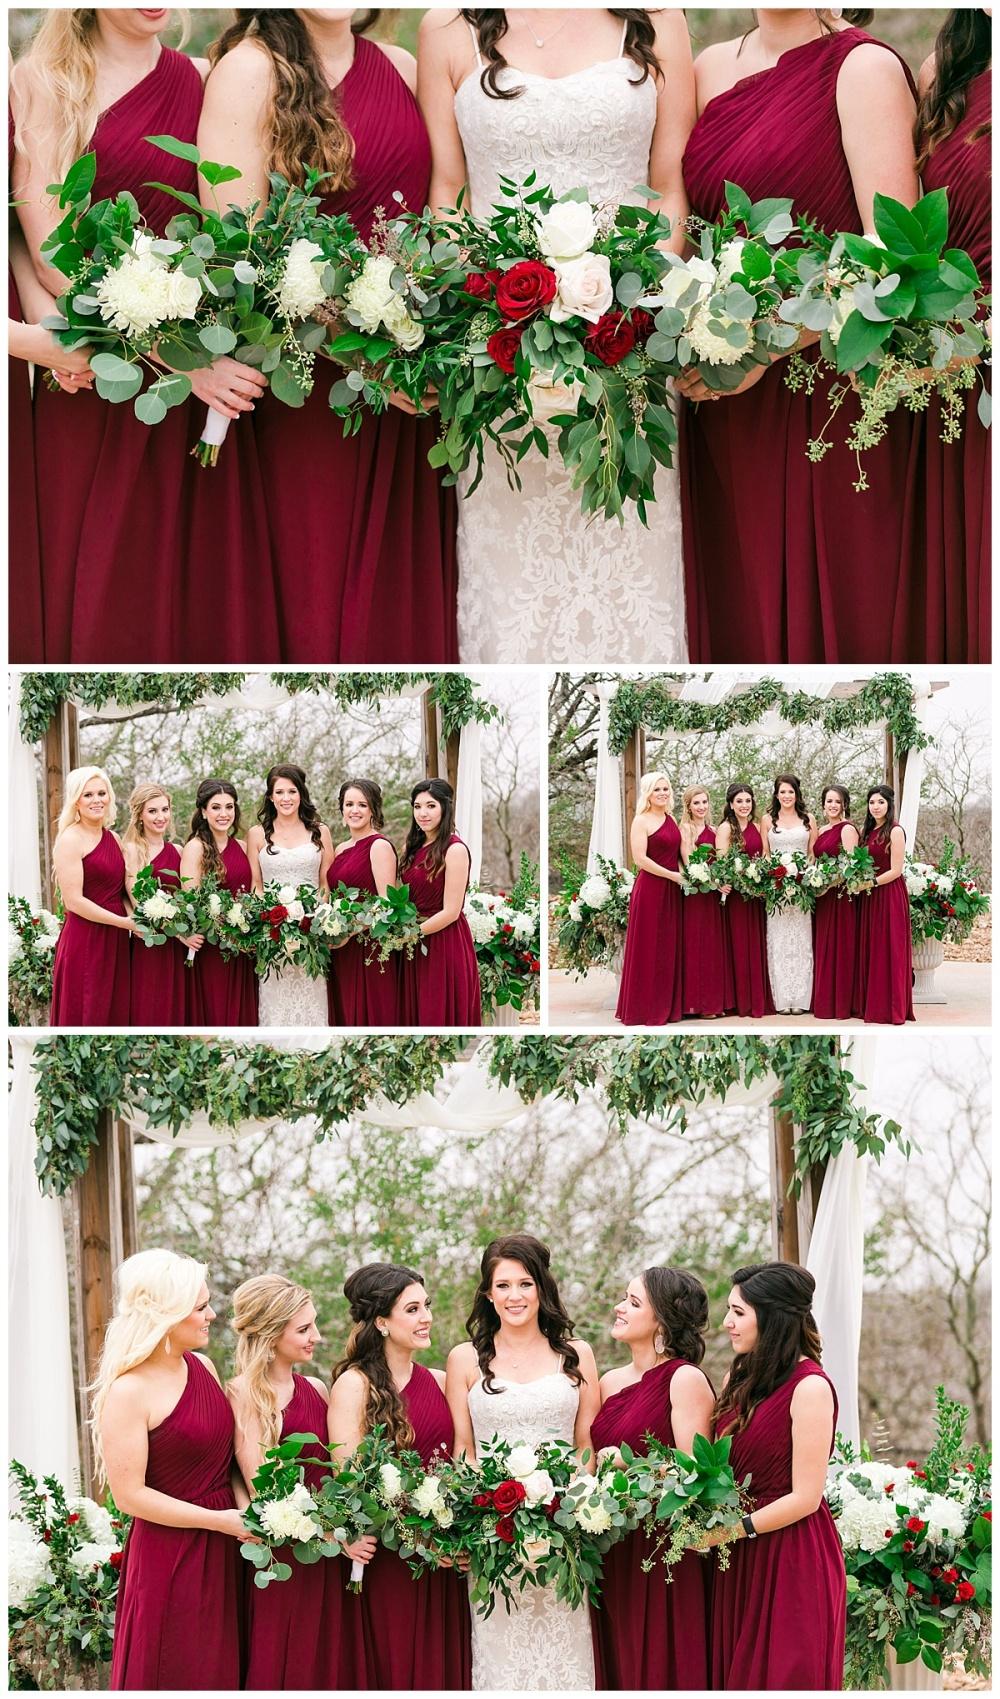 Carly-Barton-Photography-Geronimo-Oaks-Wedding-Venue-Texas-Hill-Country-Ronnie-Sarah_0108.jpg